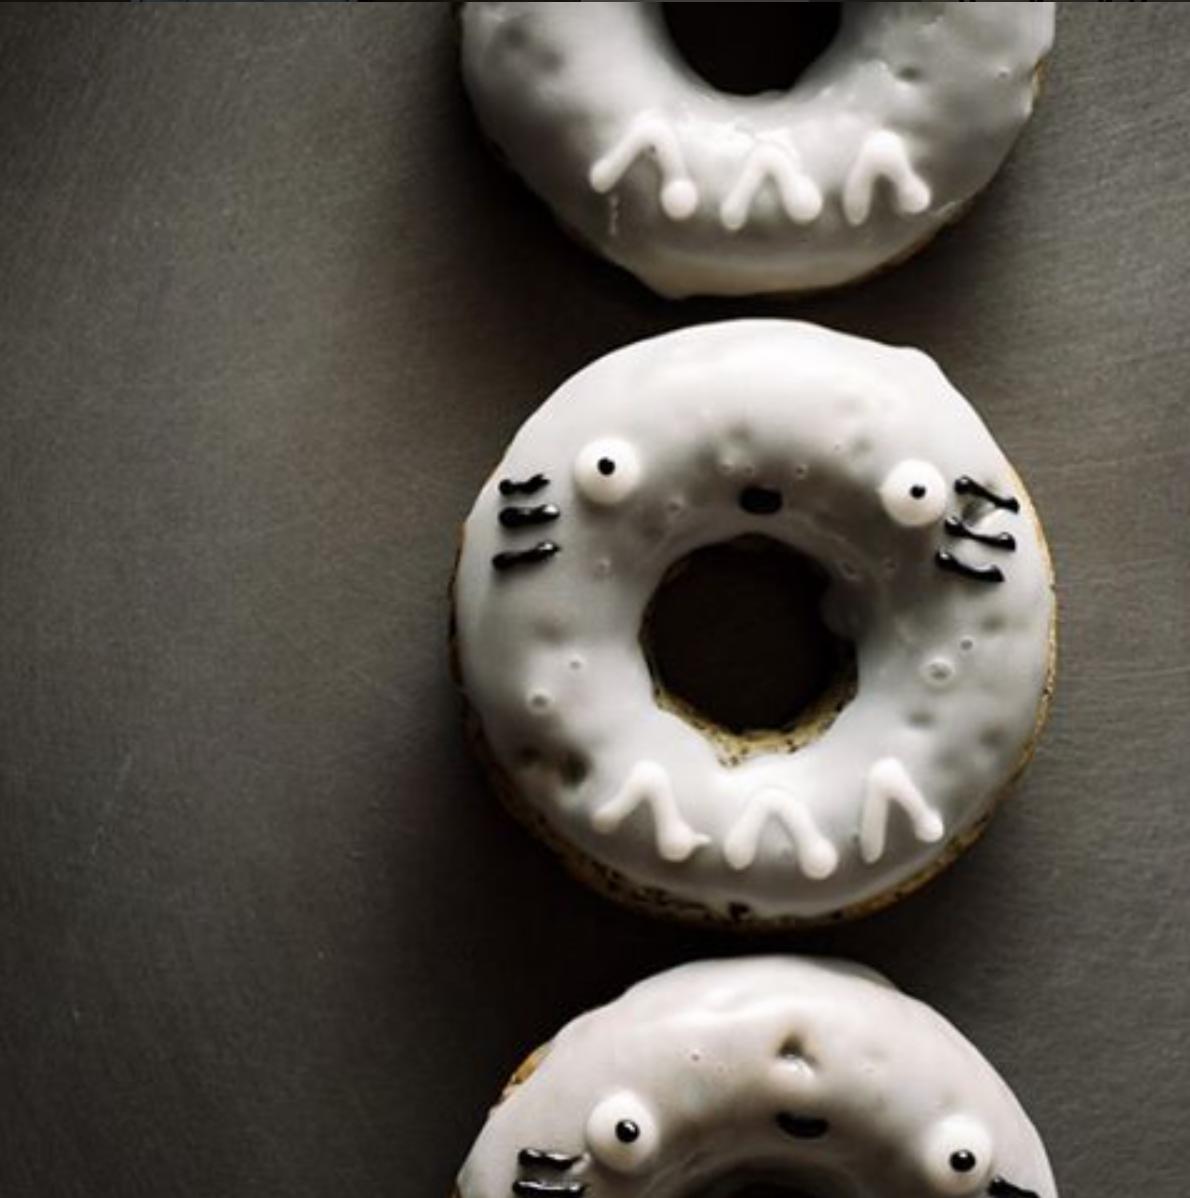 Wishing everyone a happy National Donut Day �!! #totoro #blacksesame #nationaldonutday #donutworry #studioghibli